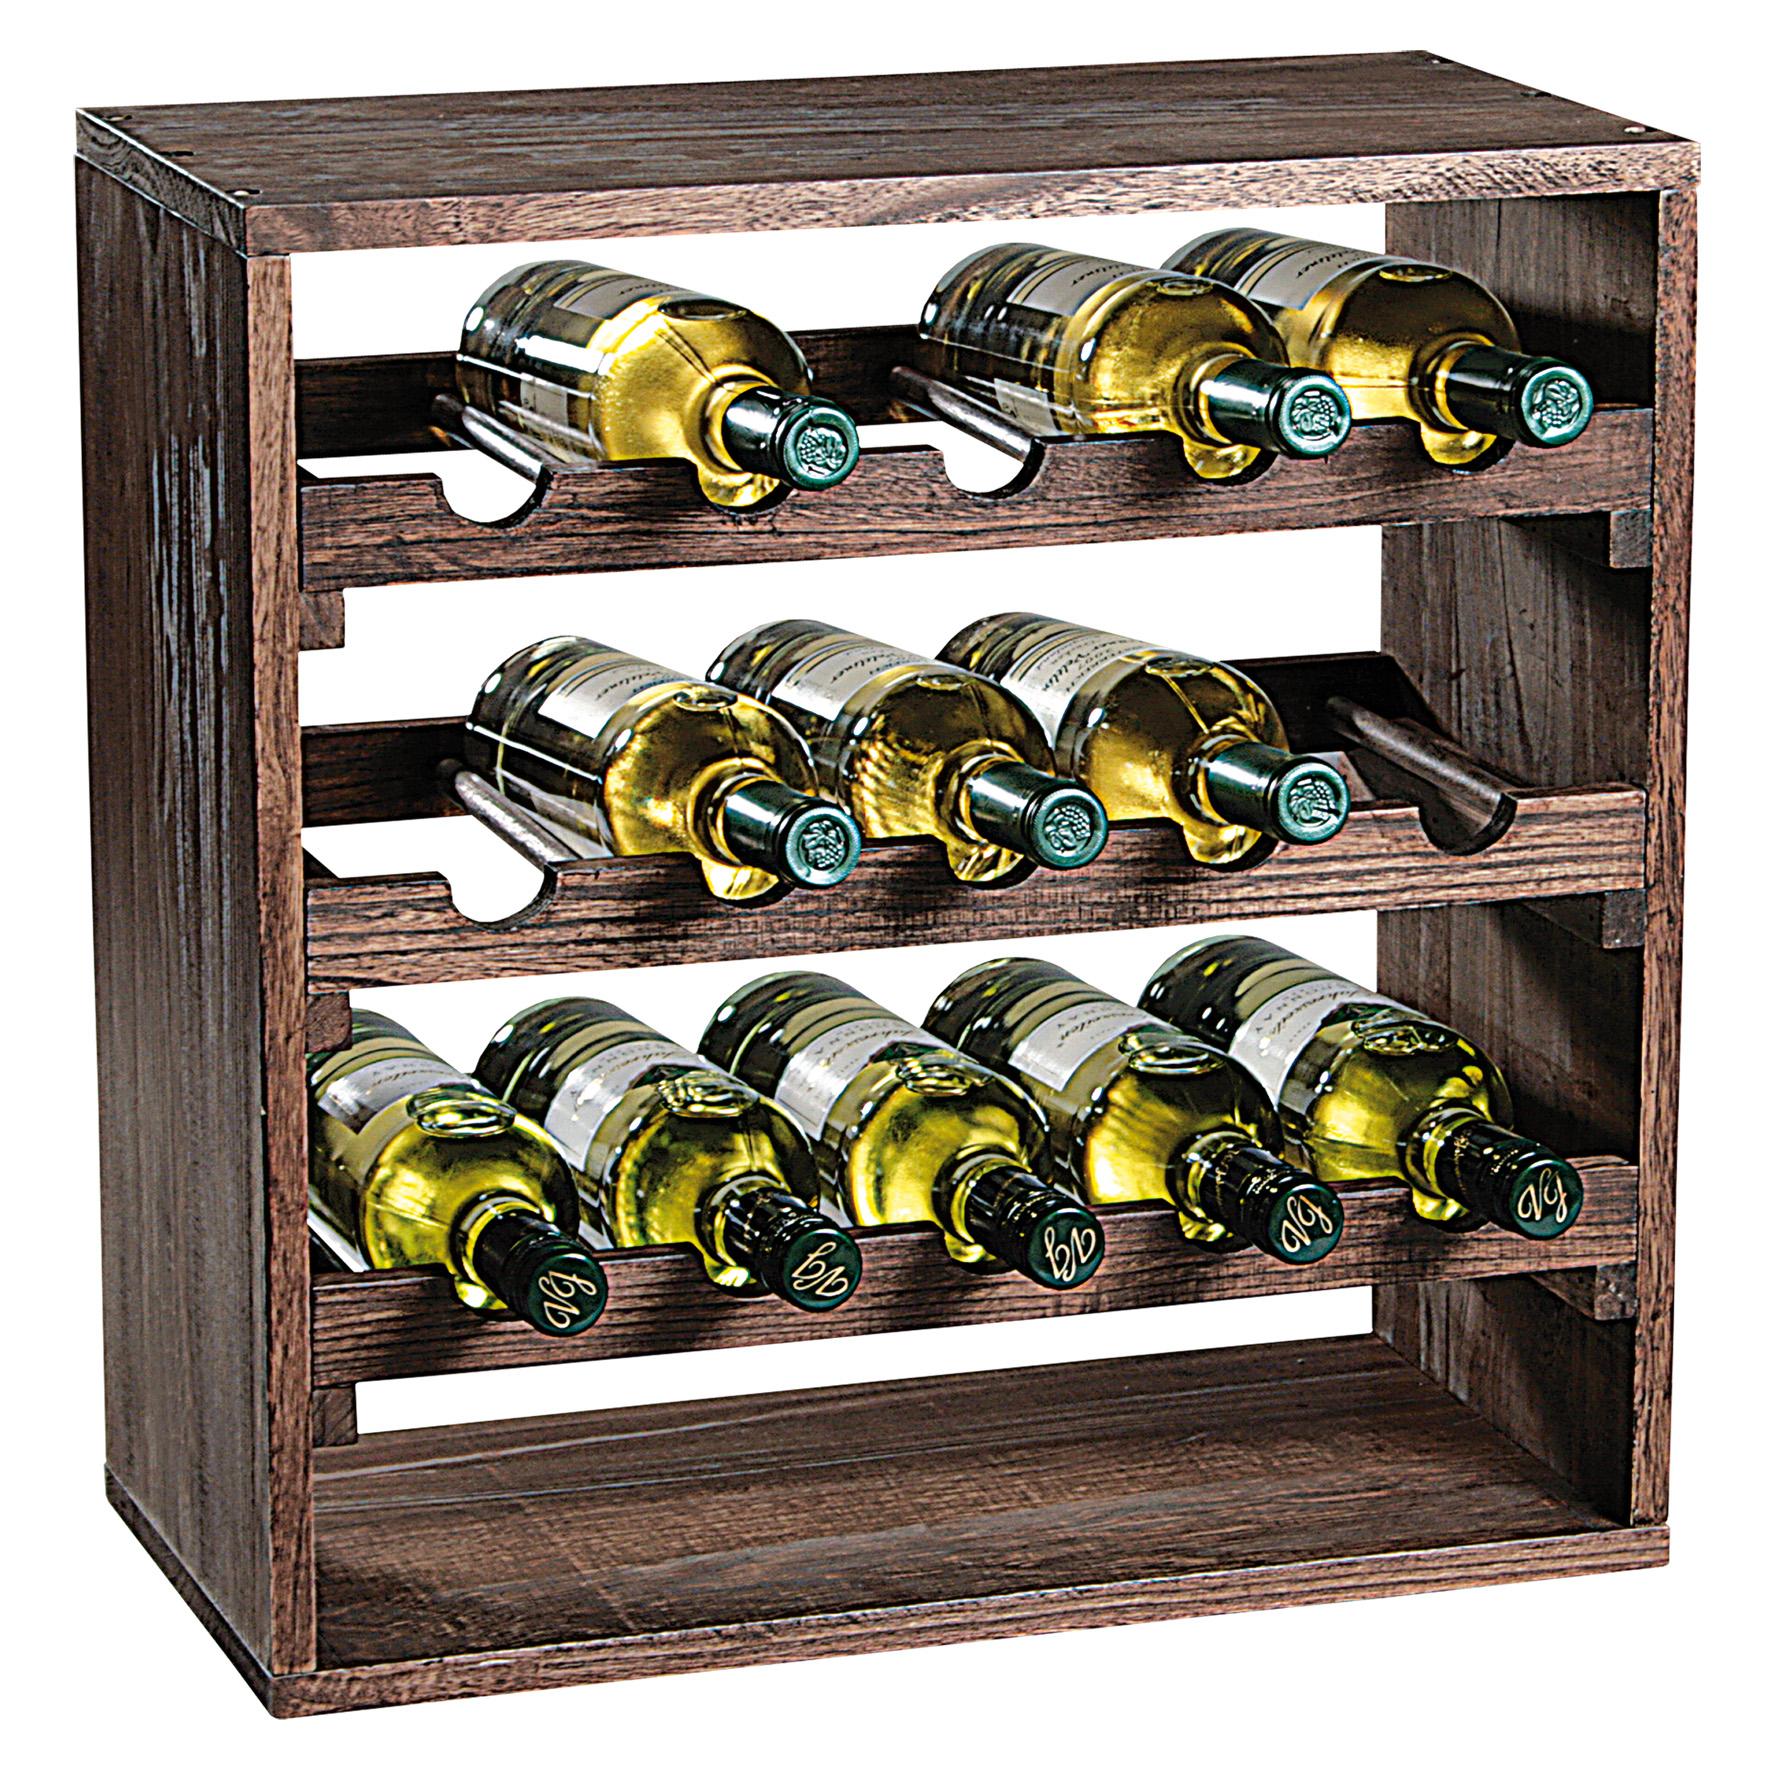 Kesper, Stojan na víno, borovice, 69243